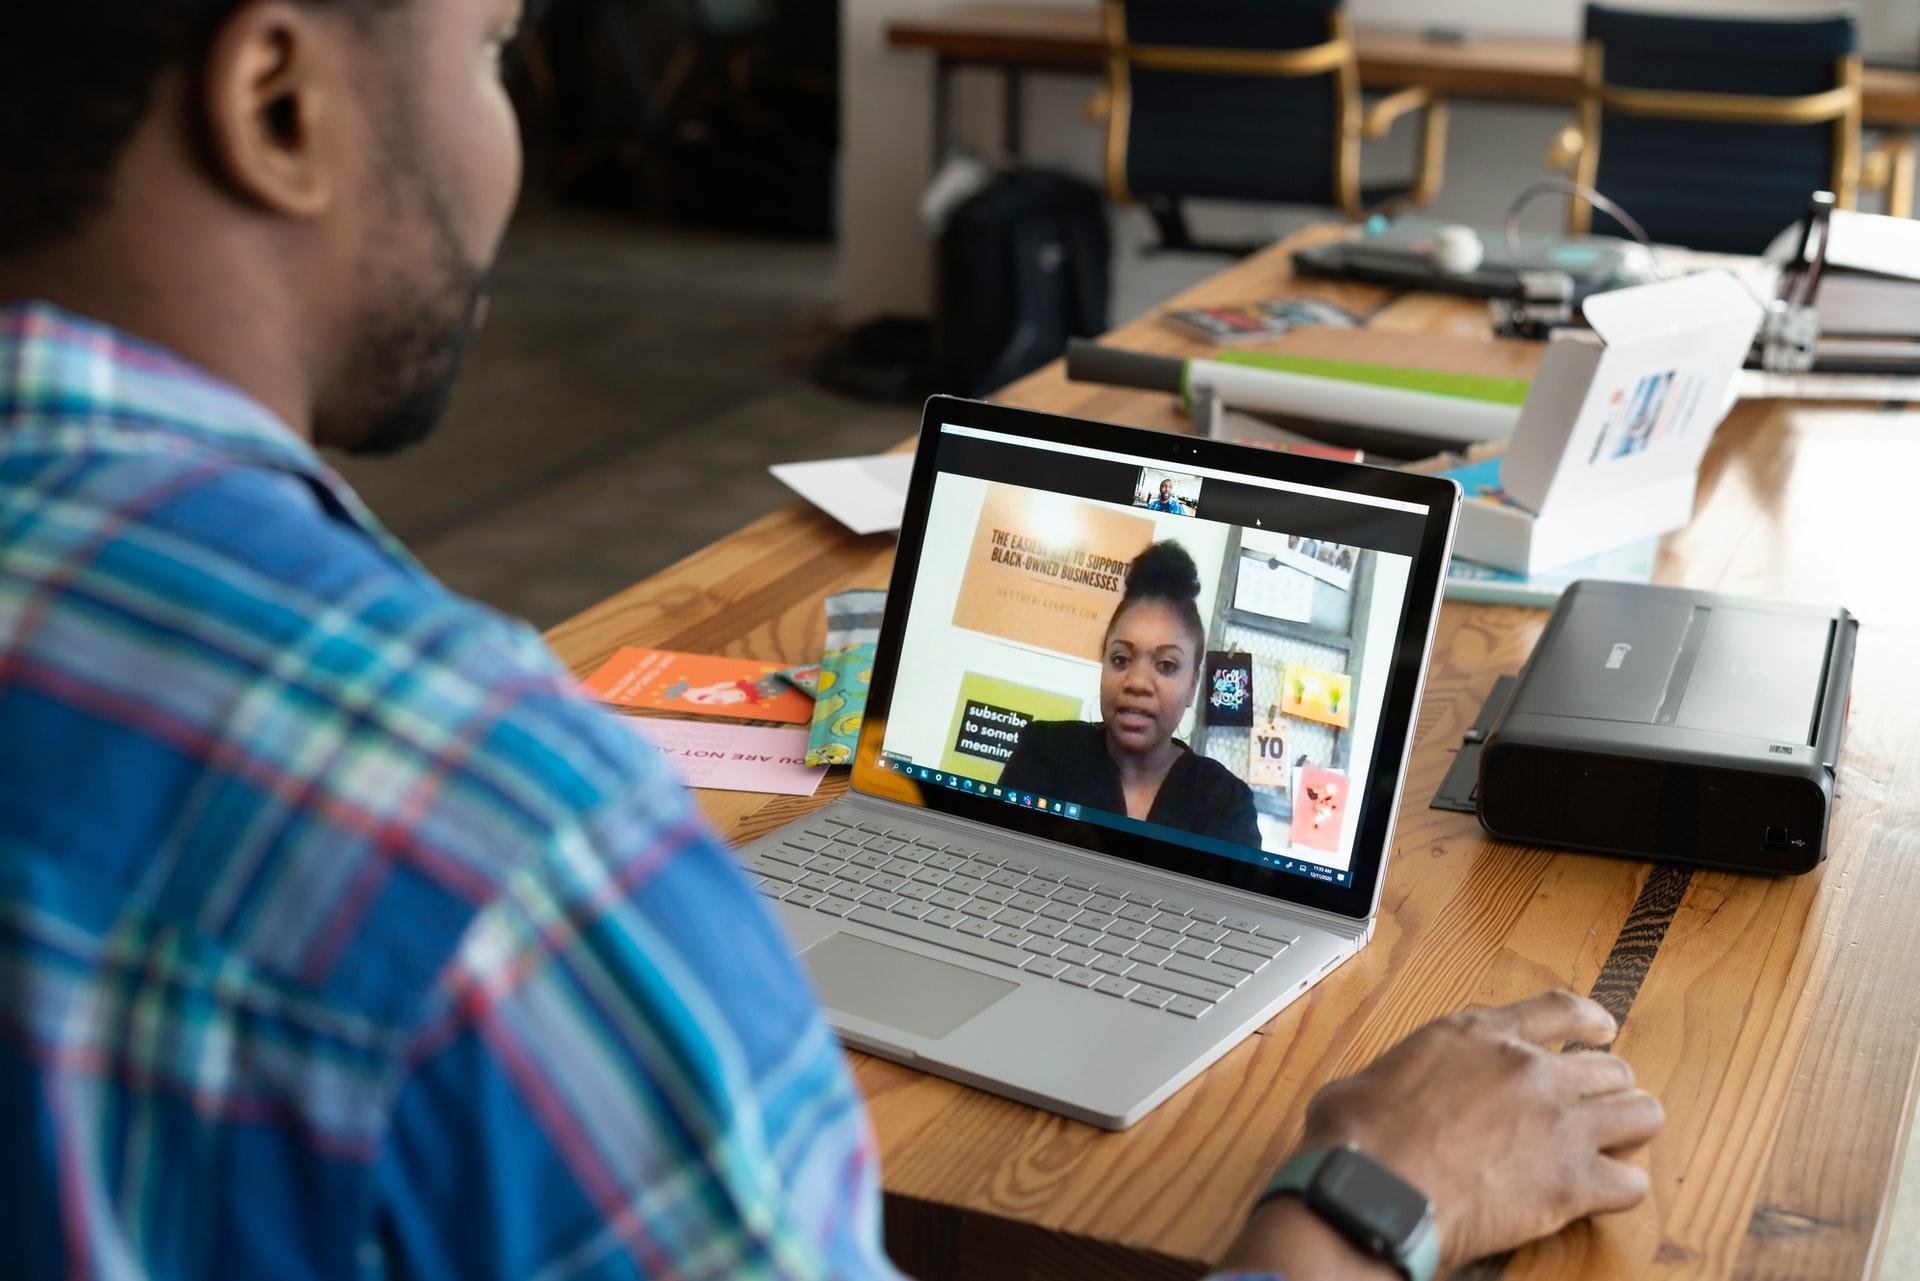 virtual job fairs and events